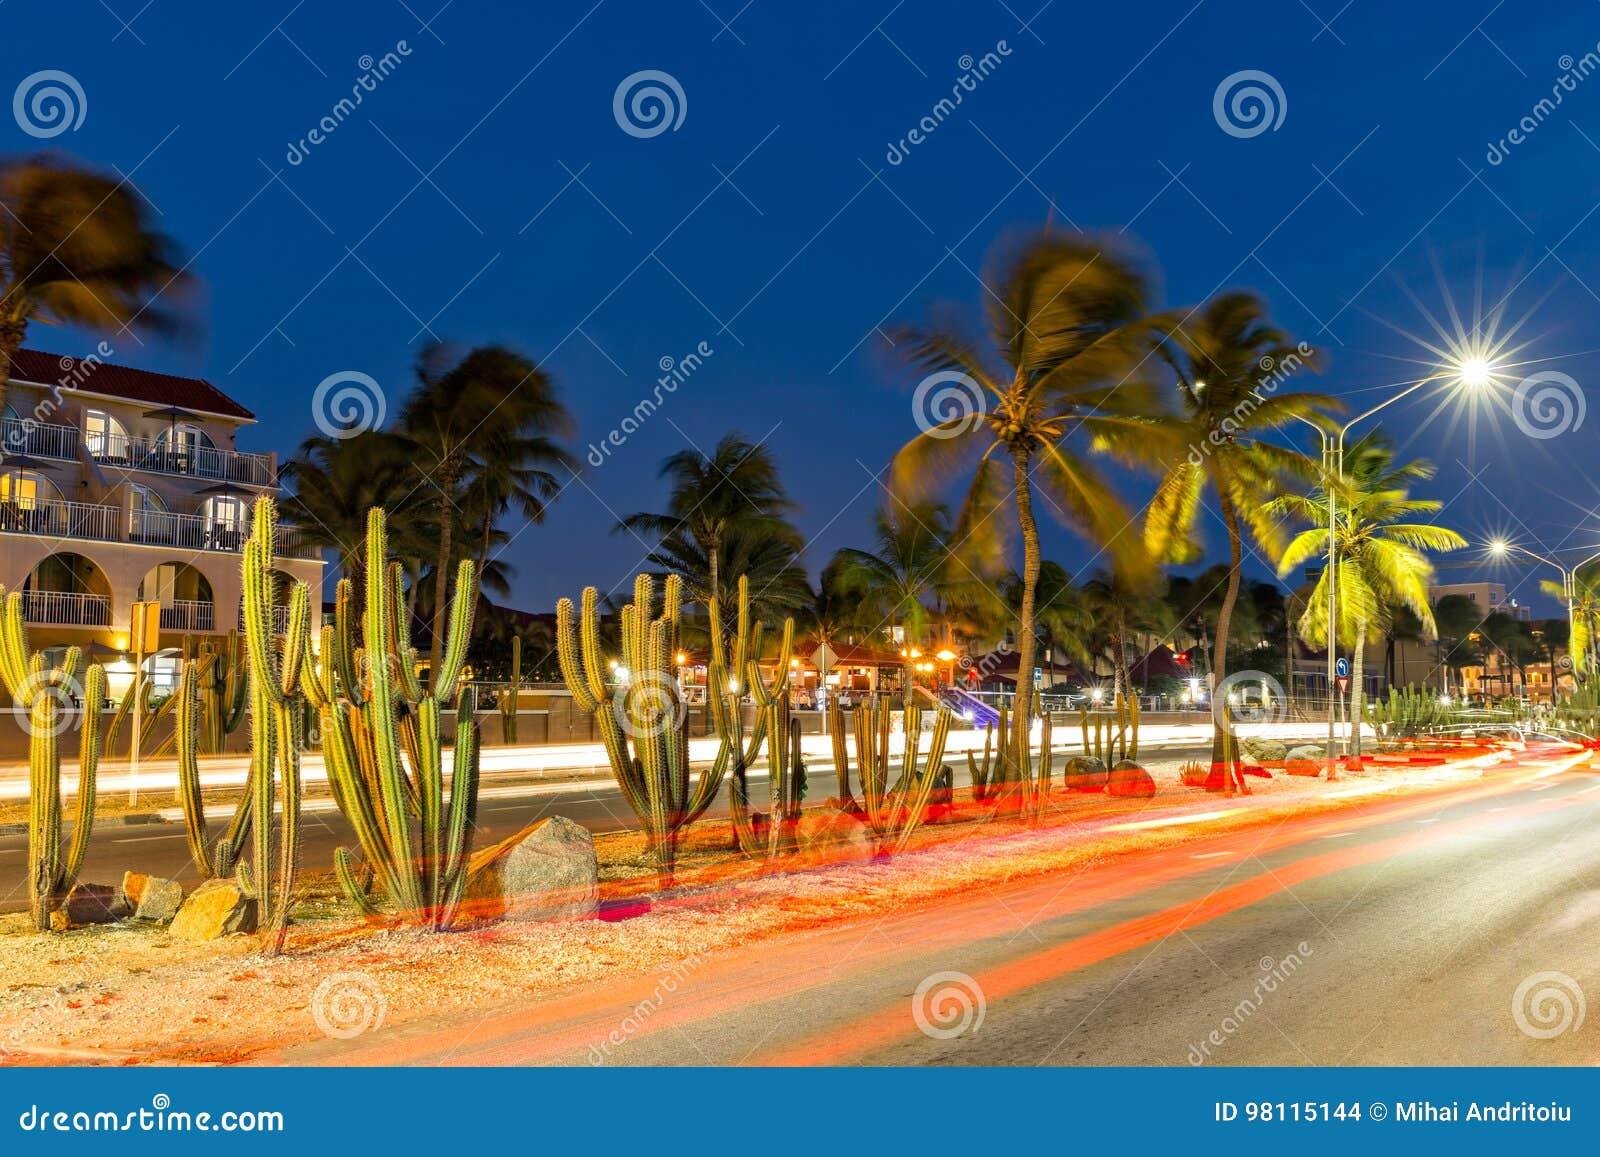 Traffic trails on JE Irausquin boulevard in Aruba